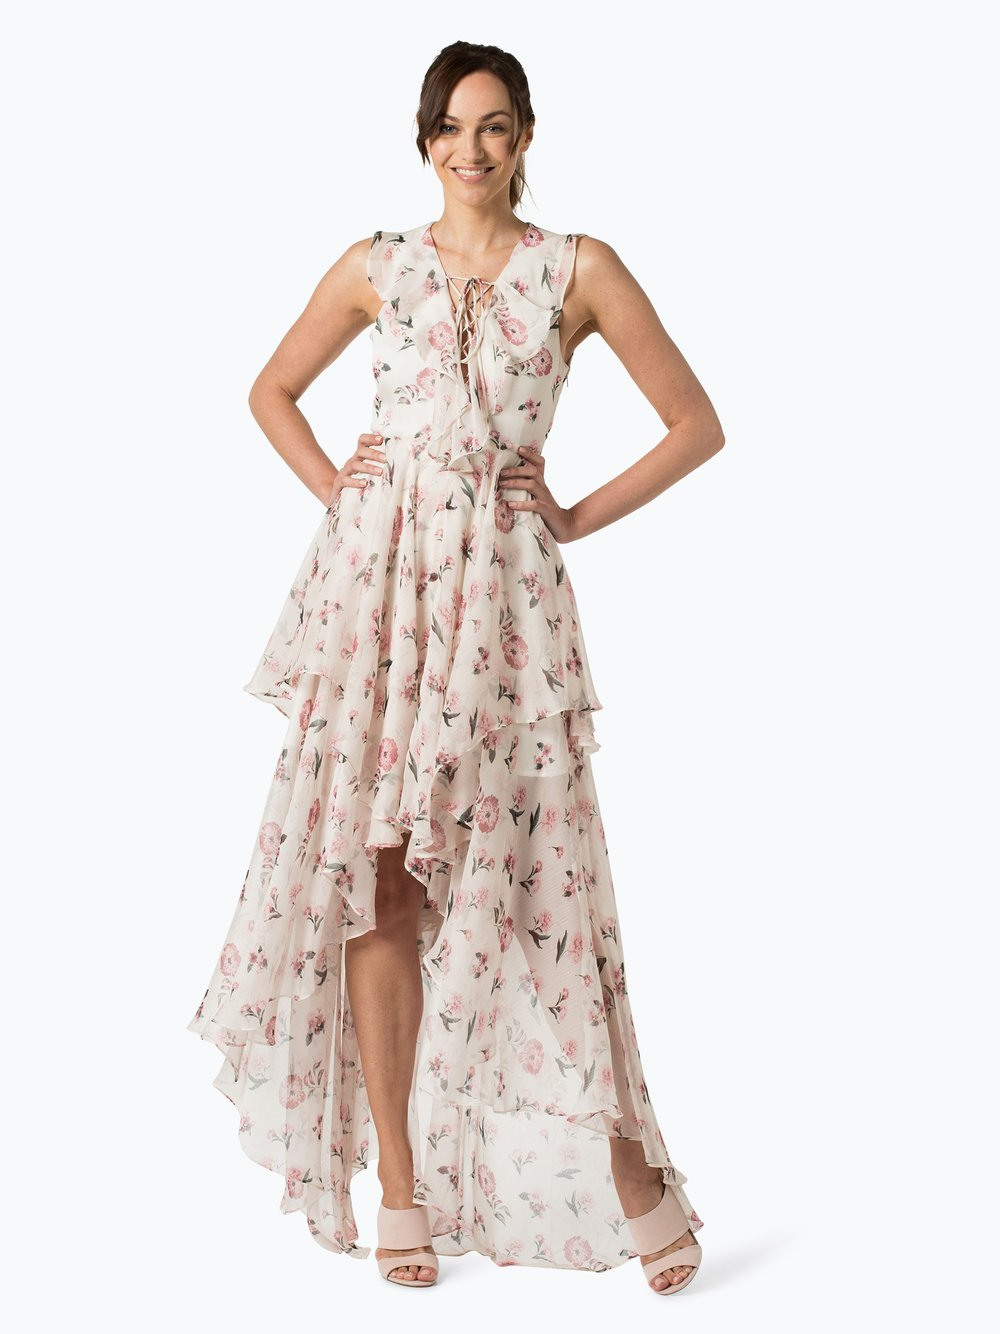 10 Schön Y.A.S Abendkleid Bester Preis15 Wunderbar Y.A.S Abendkleid Ärmel